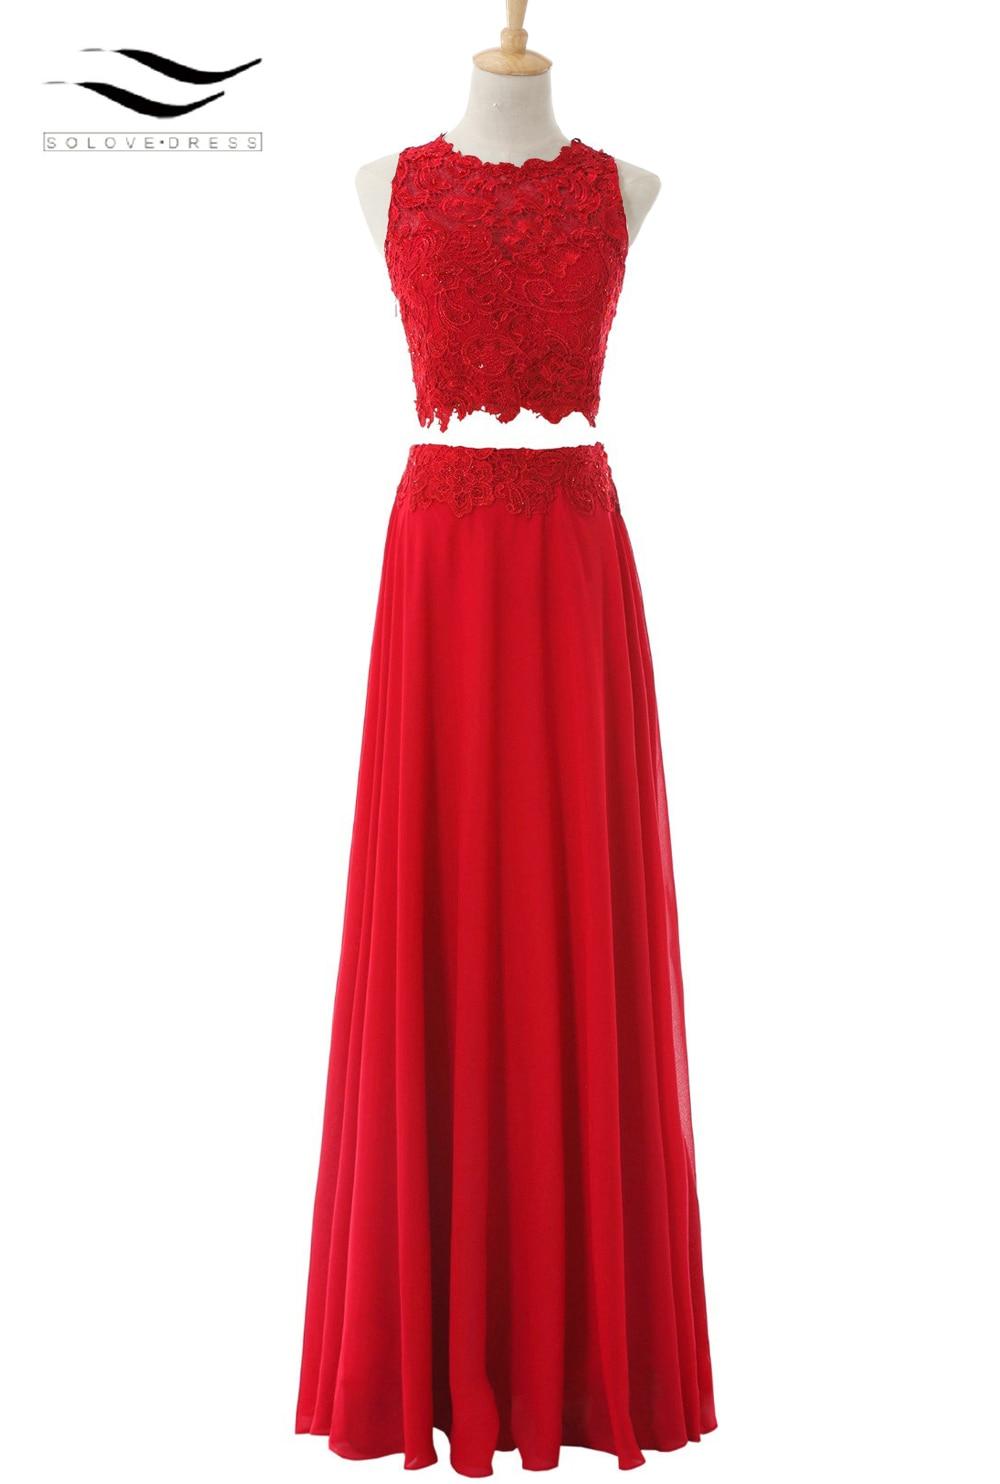 A Line Chiffon O Neck Chifon Long Two Pieces Prom Dress 2017 Red Lace Evening Gown Appliques Vestido De Fiesta Vestidos SL-P329